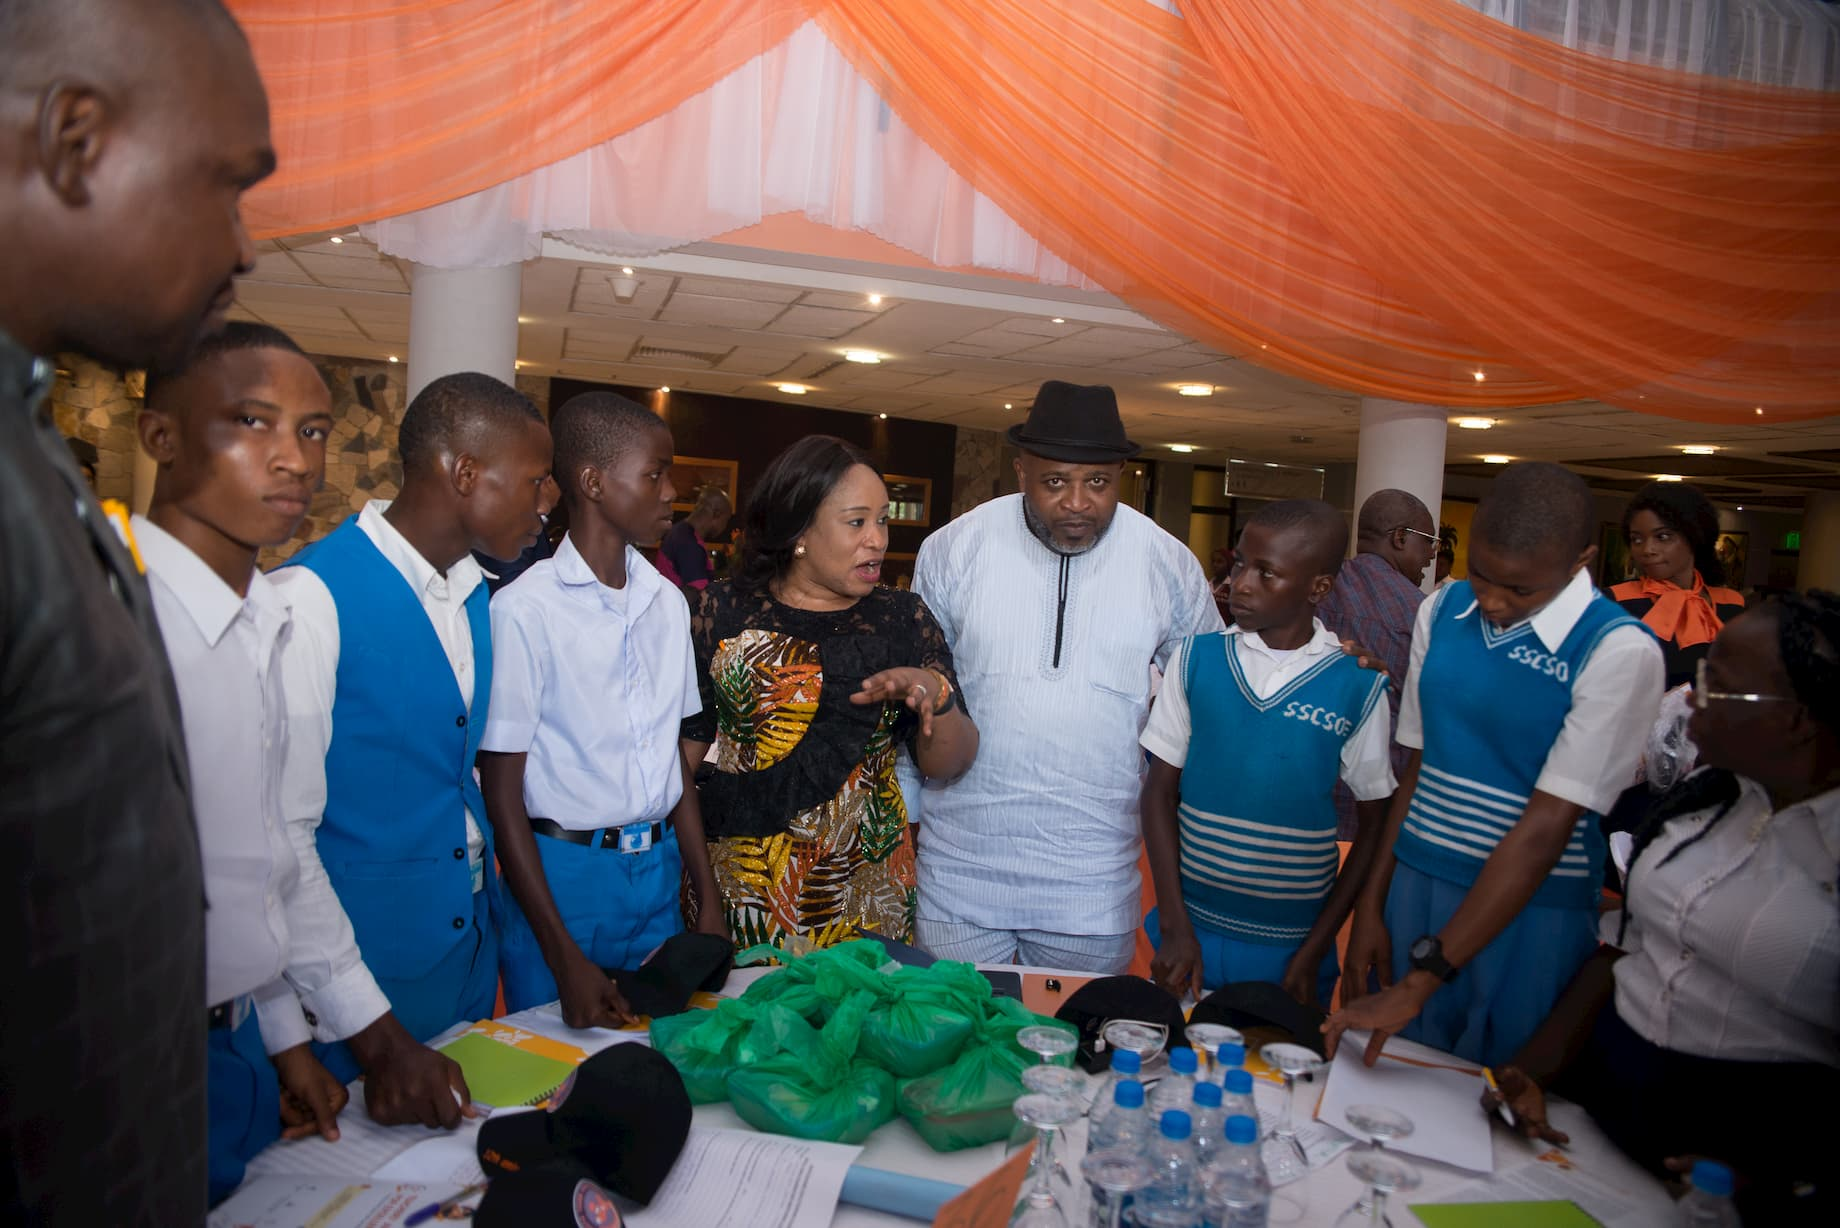 Mr. Kufre Ekanem and the students of his adopted school State Sec. Com. Sch, Okop Eto Rd, Ikot Ekpene